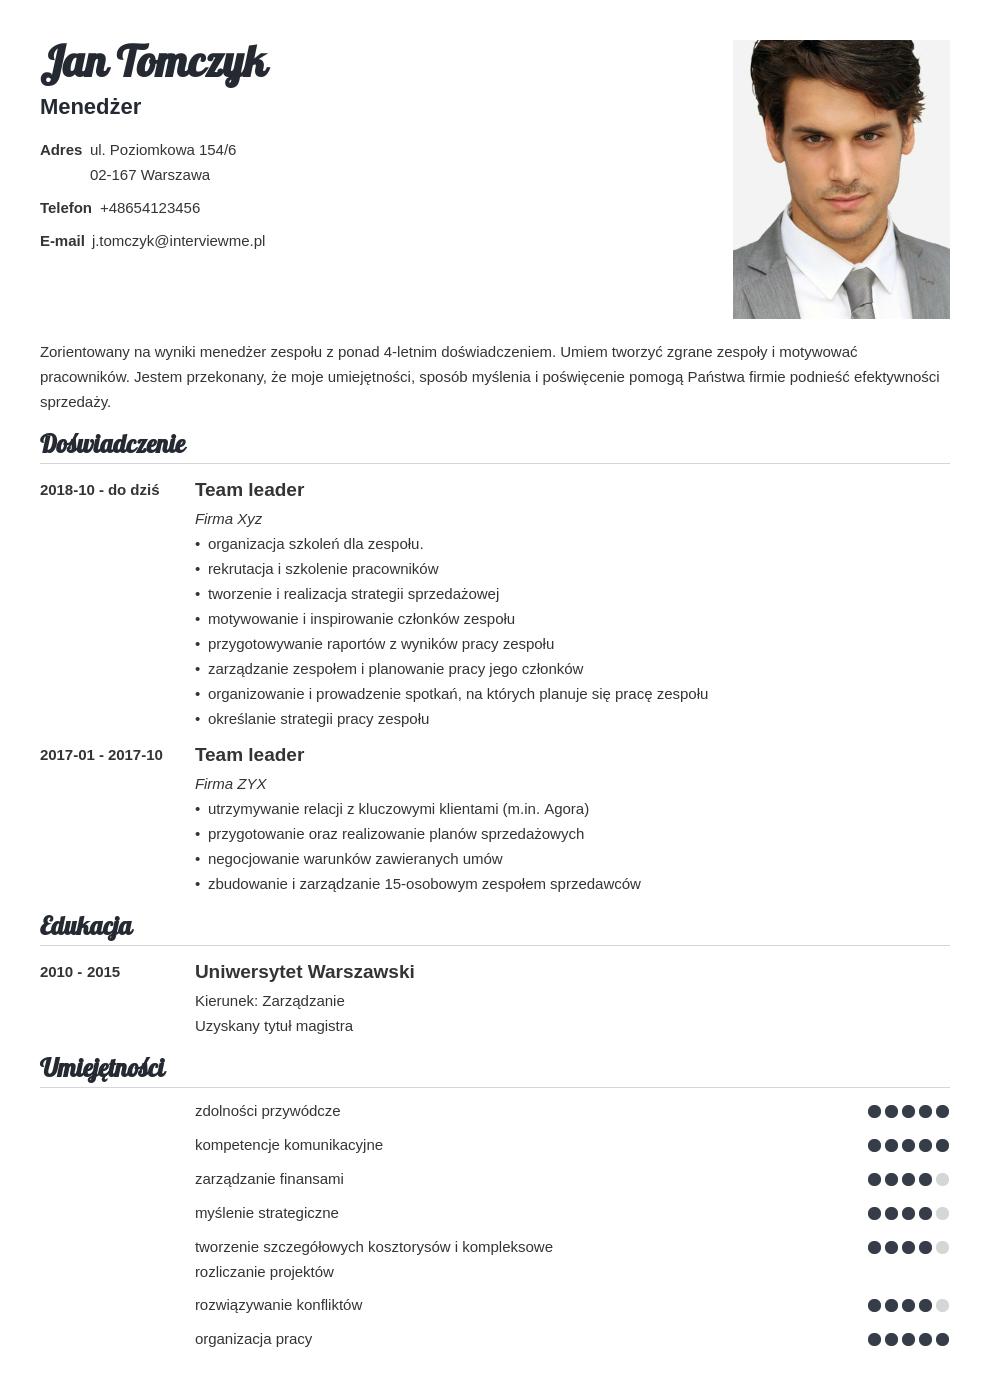 cv list motywacyjny managera template valera